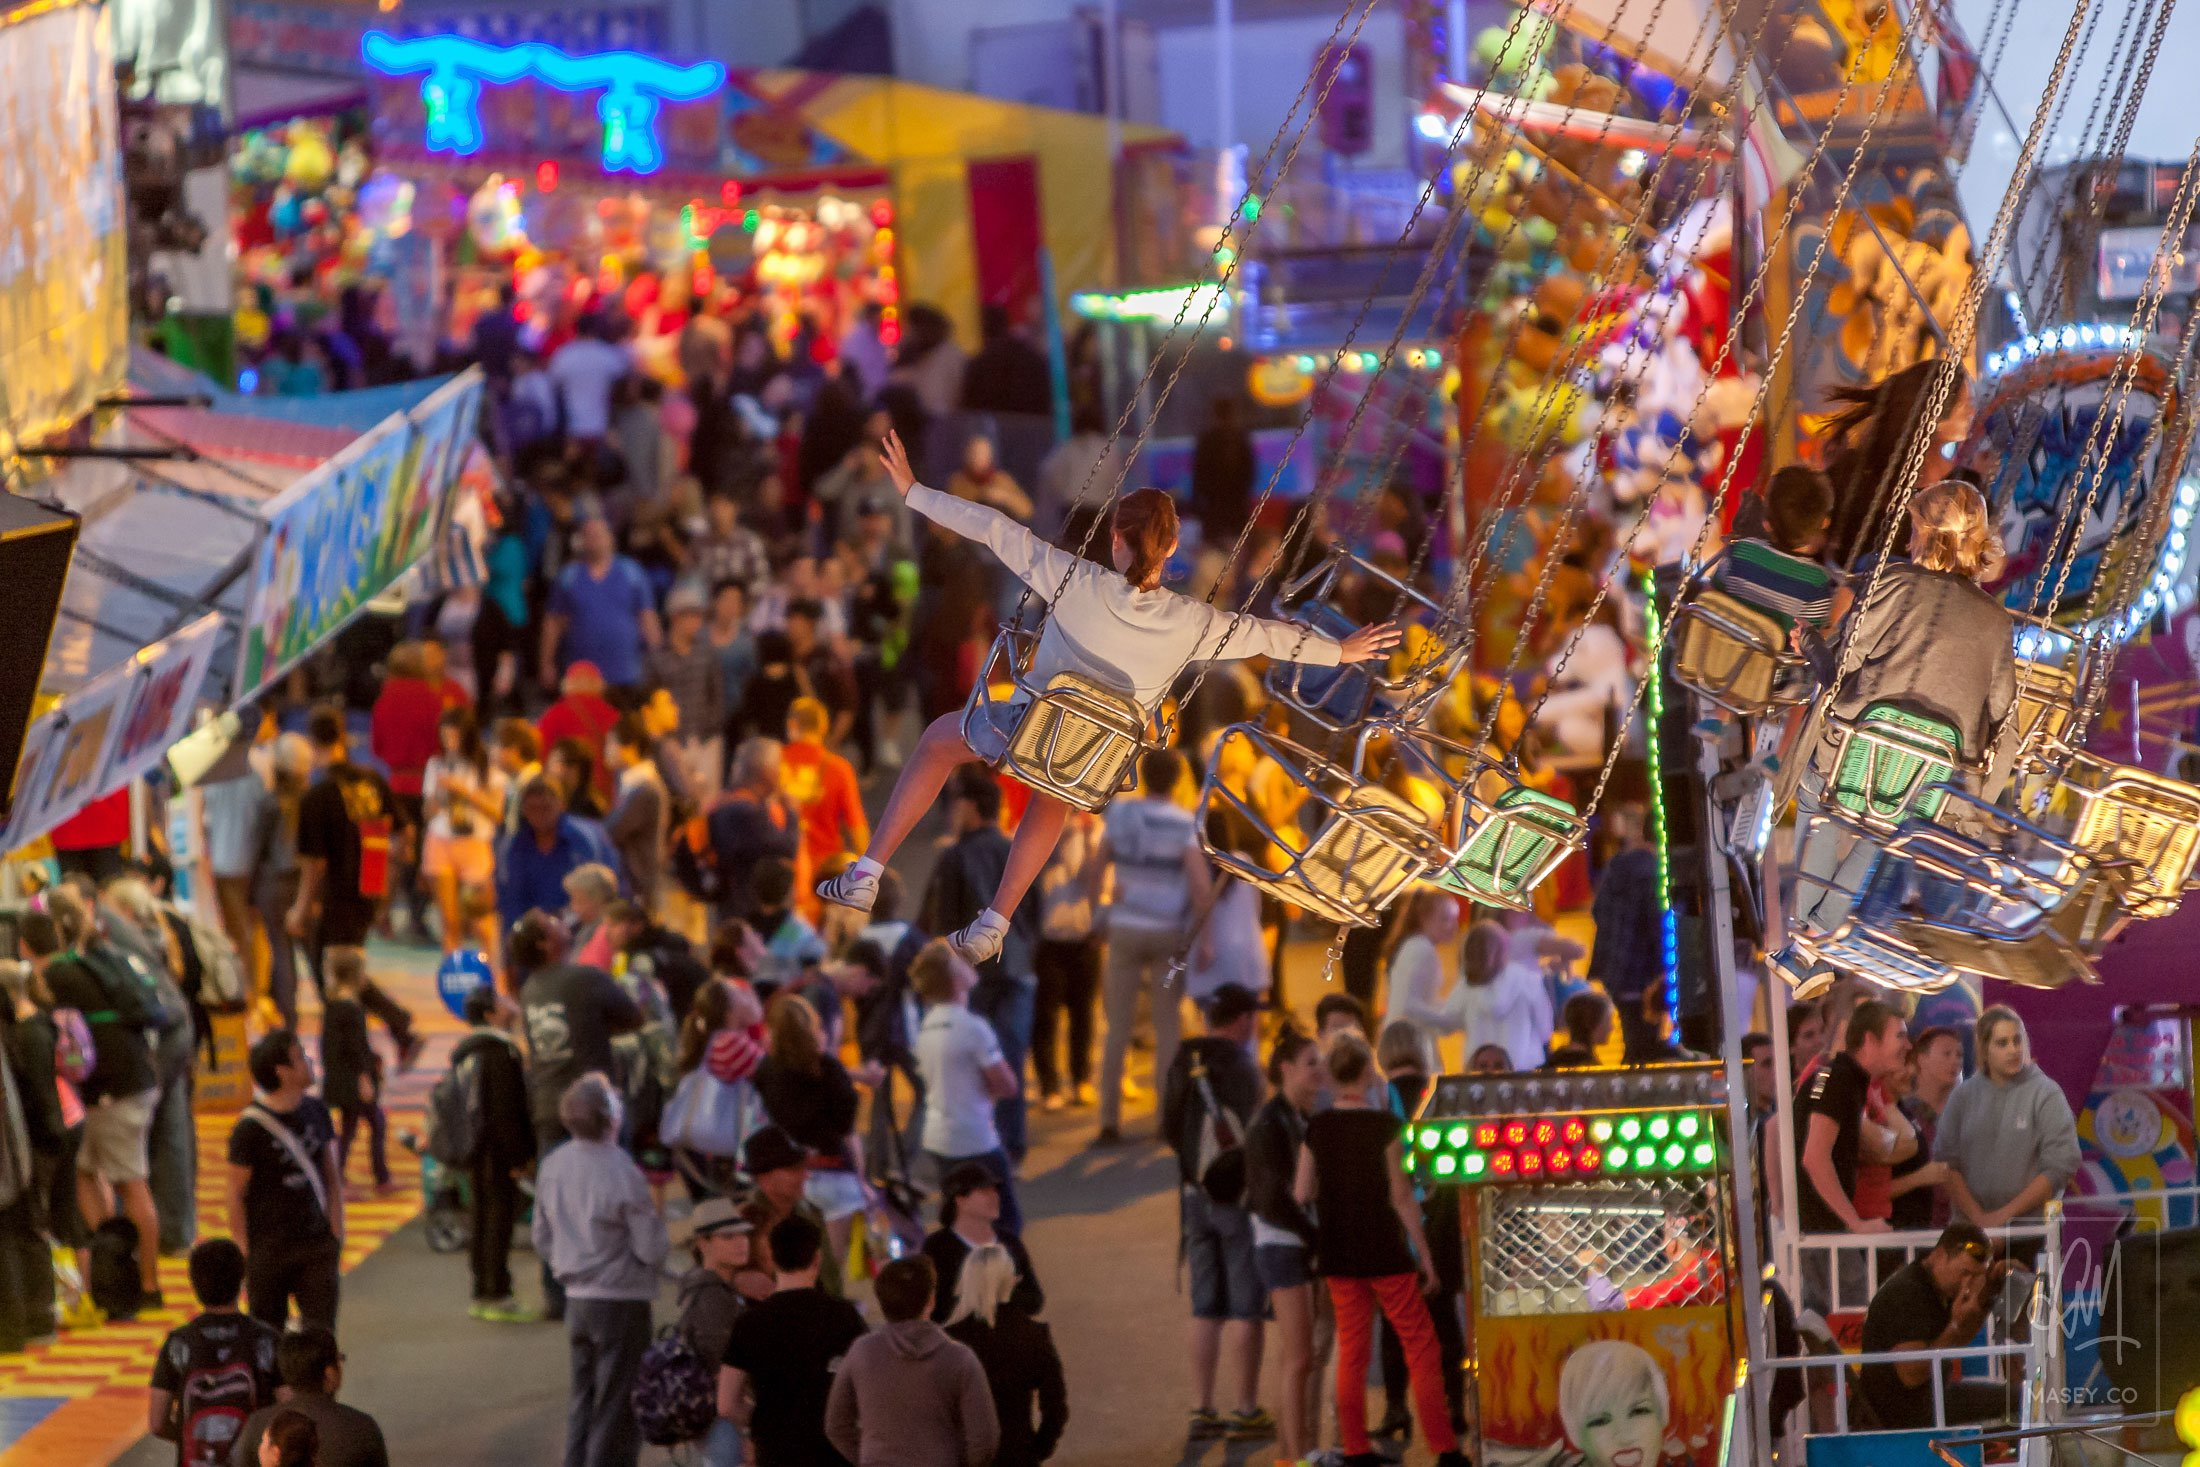 Brisbane EKKA Sideshow Alley 2013